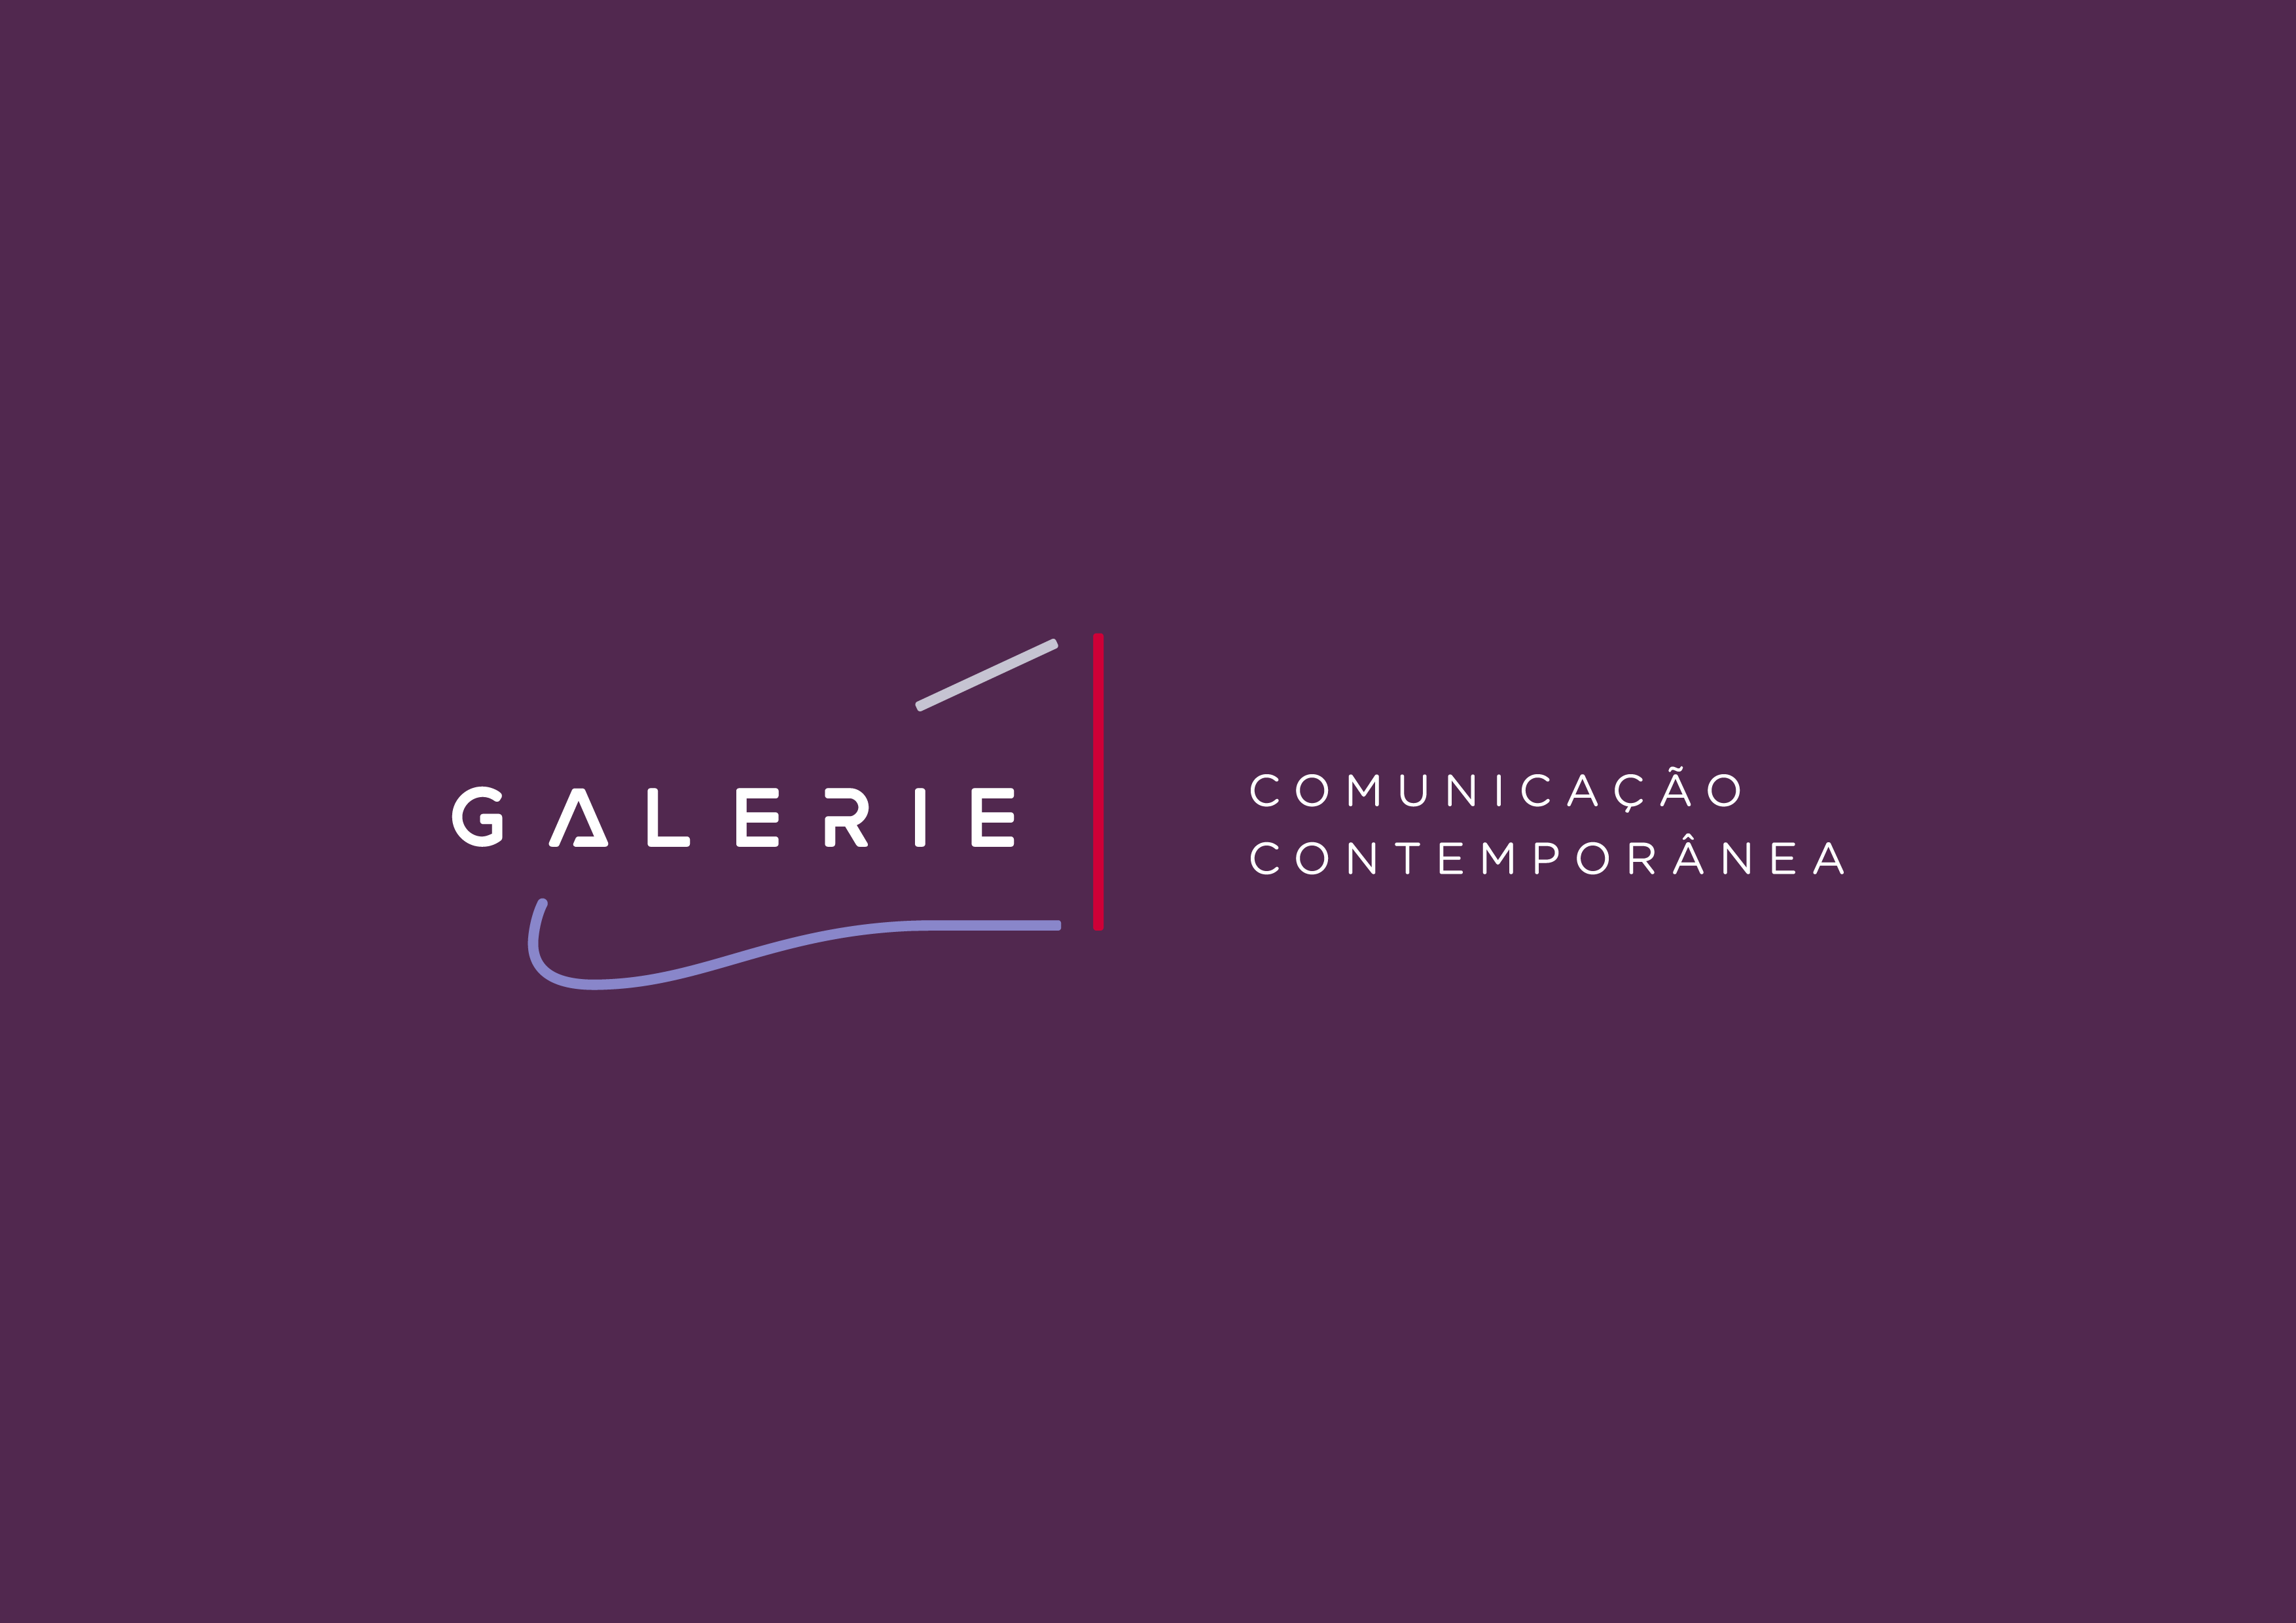 AF-GALERIE-MARCA-RGB-Versao_negativa-Preferencial-01